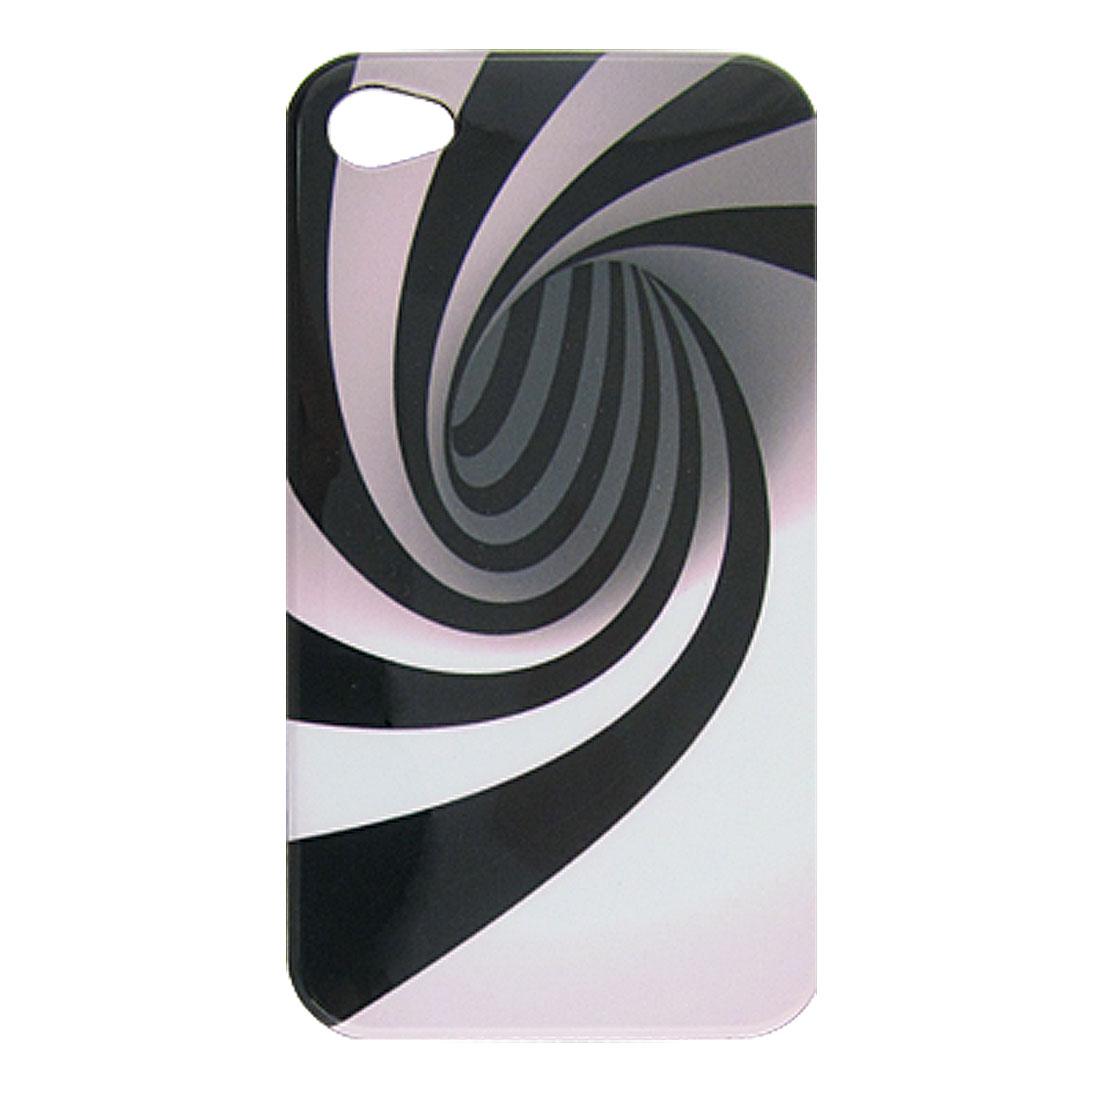 Swirl Black Stripe Plastic Back Cover for iPhone 4 4G